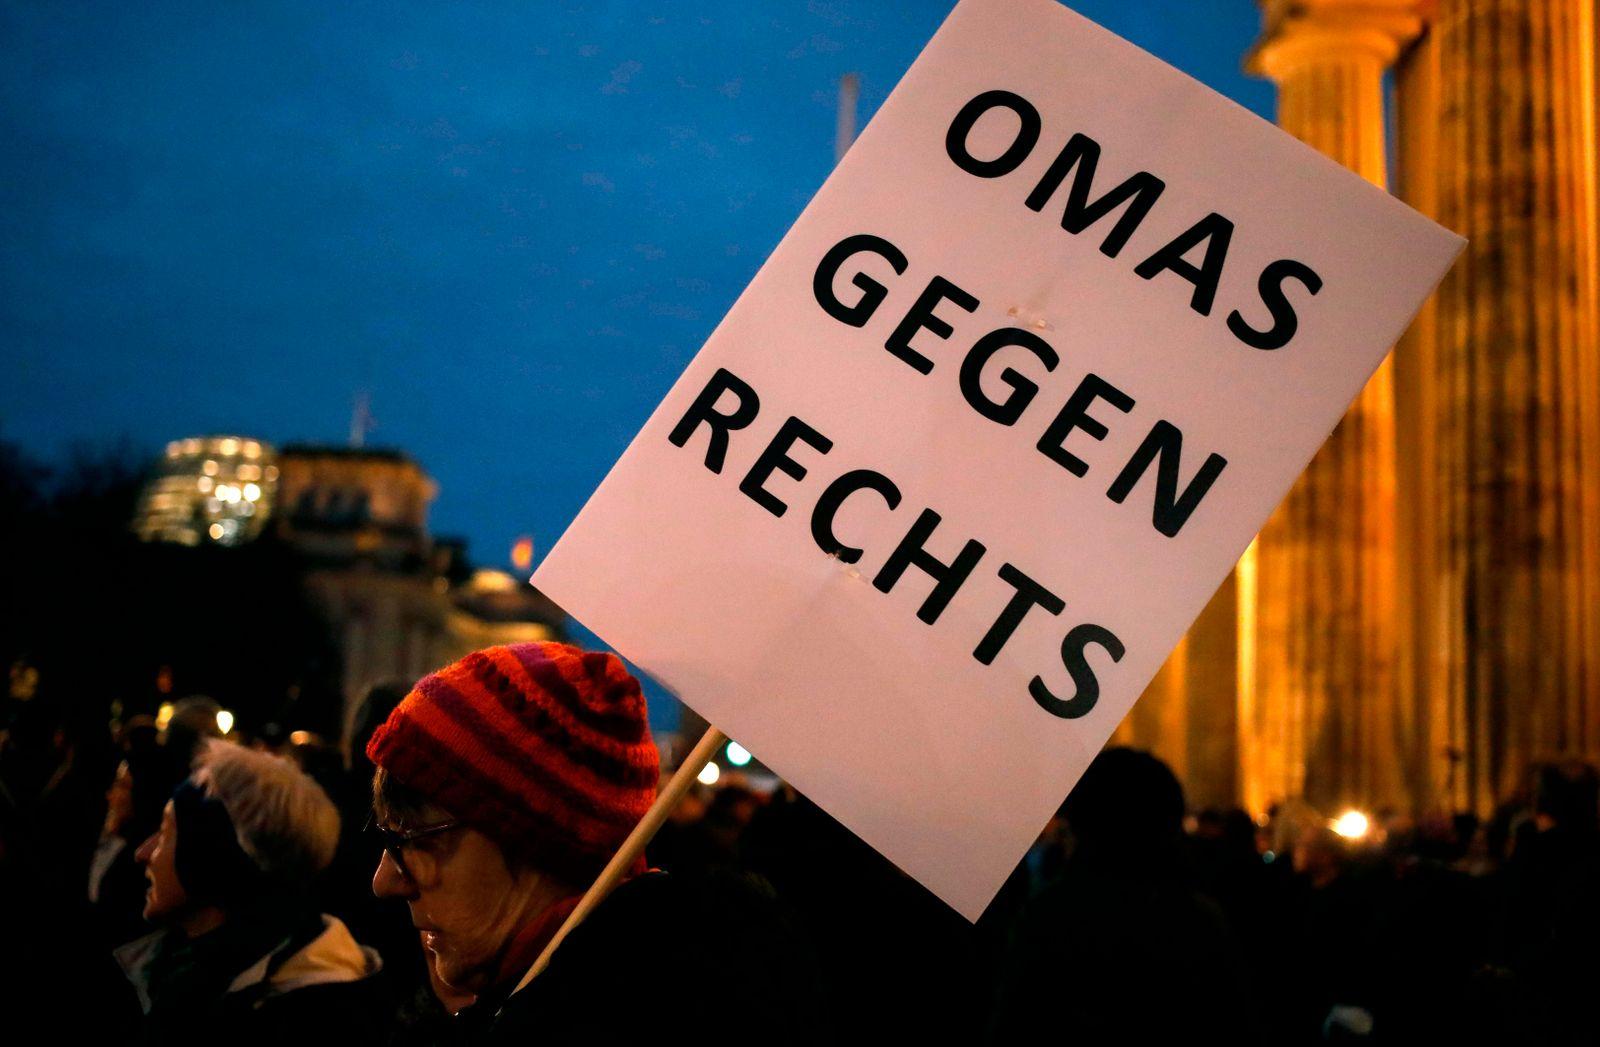 GERMANY-SHOOTING-FARRIGHT-TERRORISM